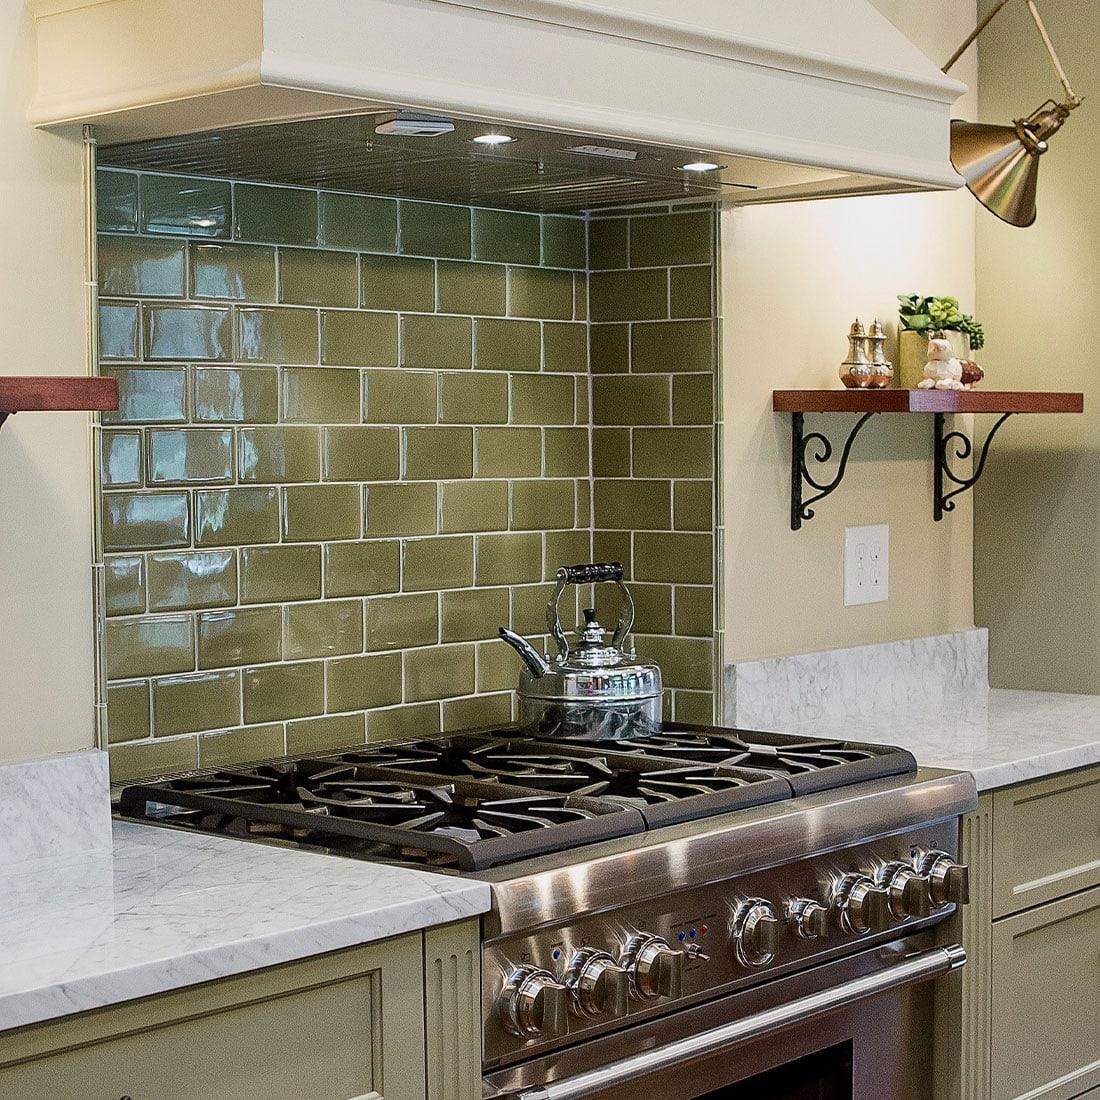 modern kitchen range with green tile backsplash in renovated kitchen